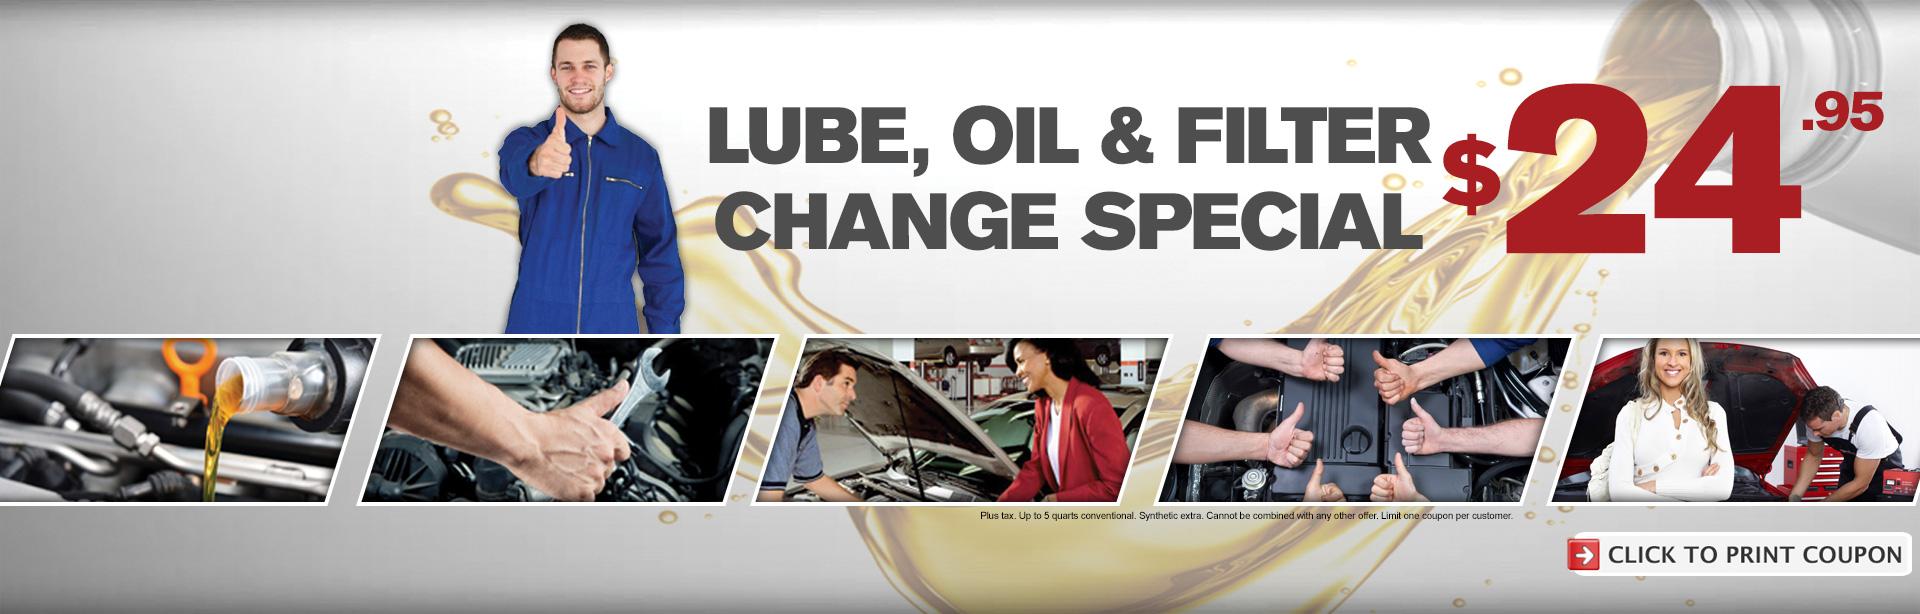 Oil Change Special - Bay Automotive - Norfolk VA